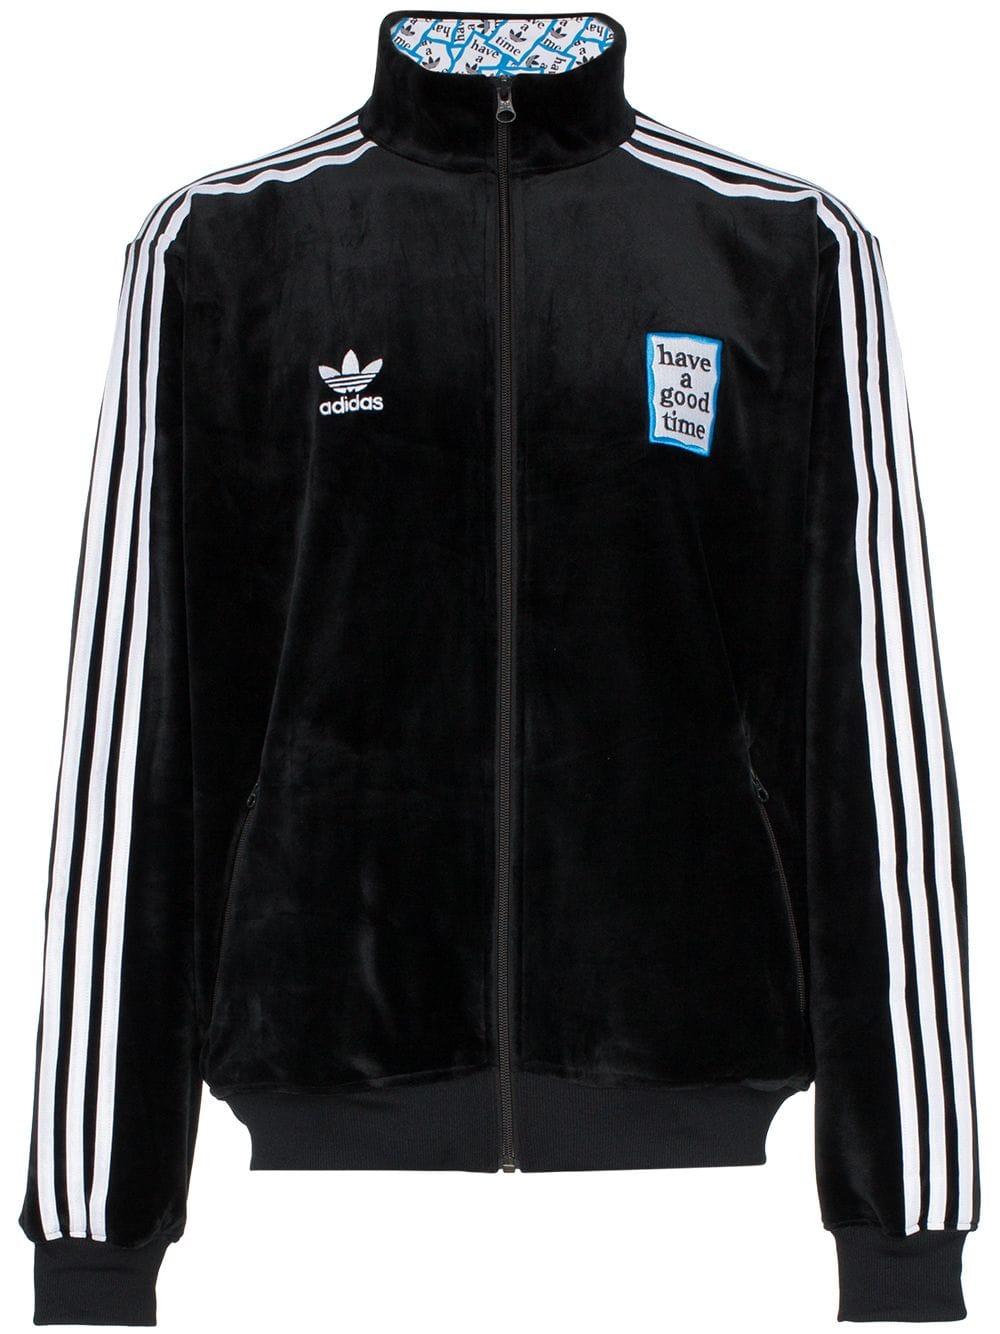 Adidas x Have A Good Time Men Velour Track Top Jacket (black)